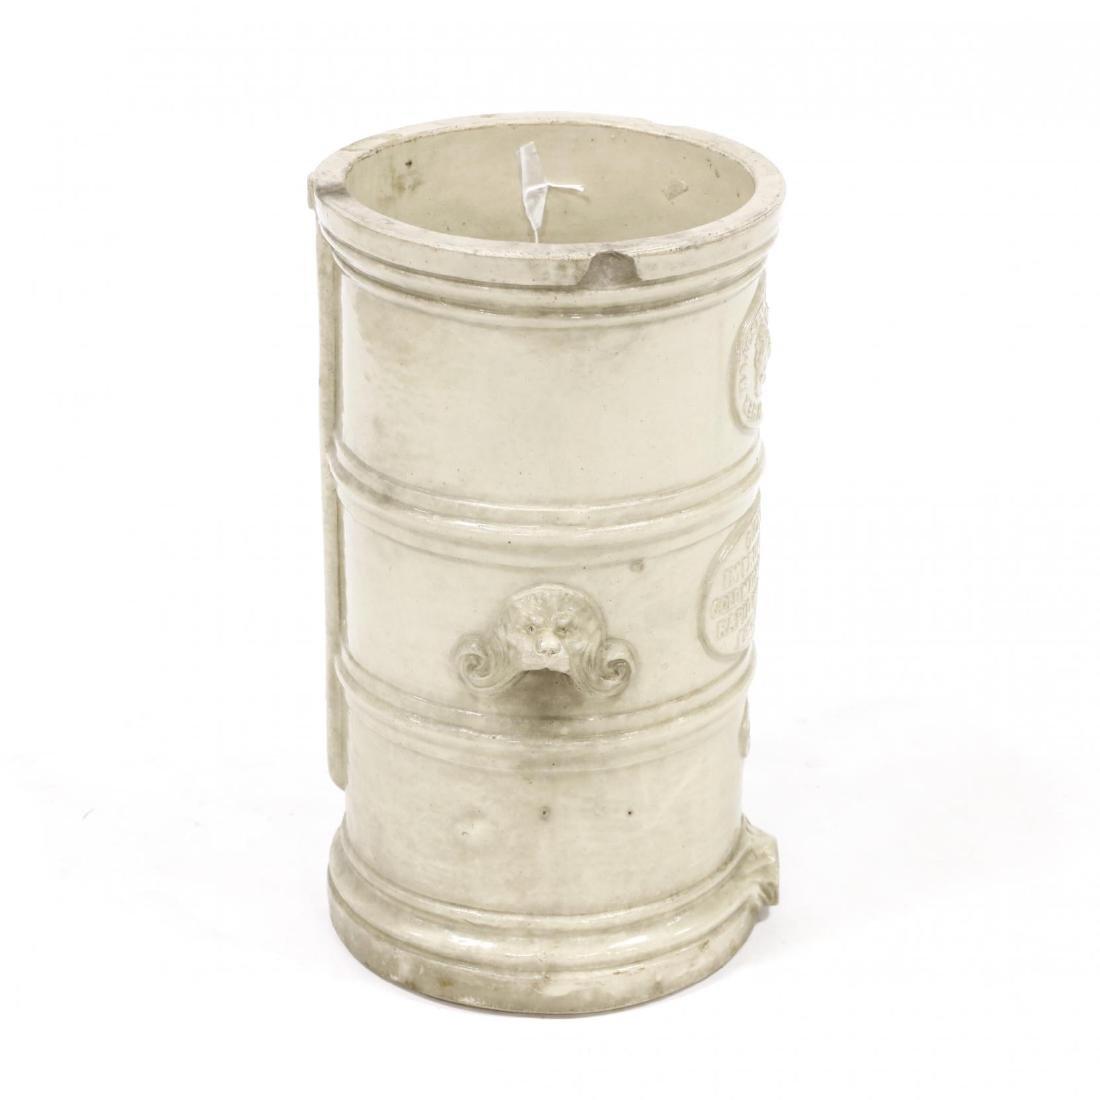 G. Cheavins, Antique English Stoneware Water Filter - 4